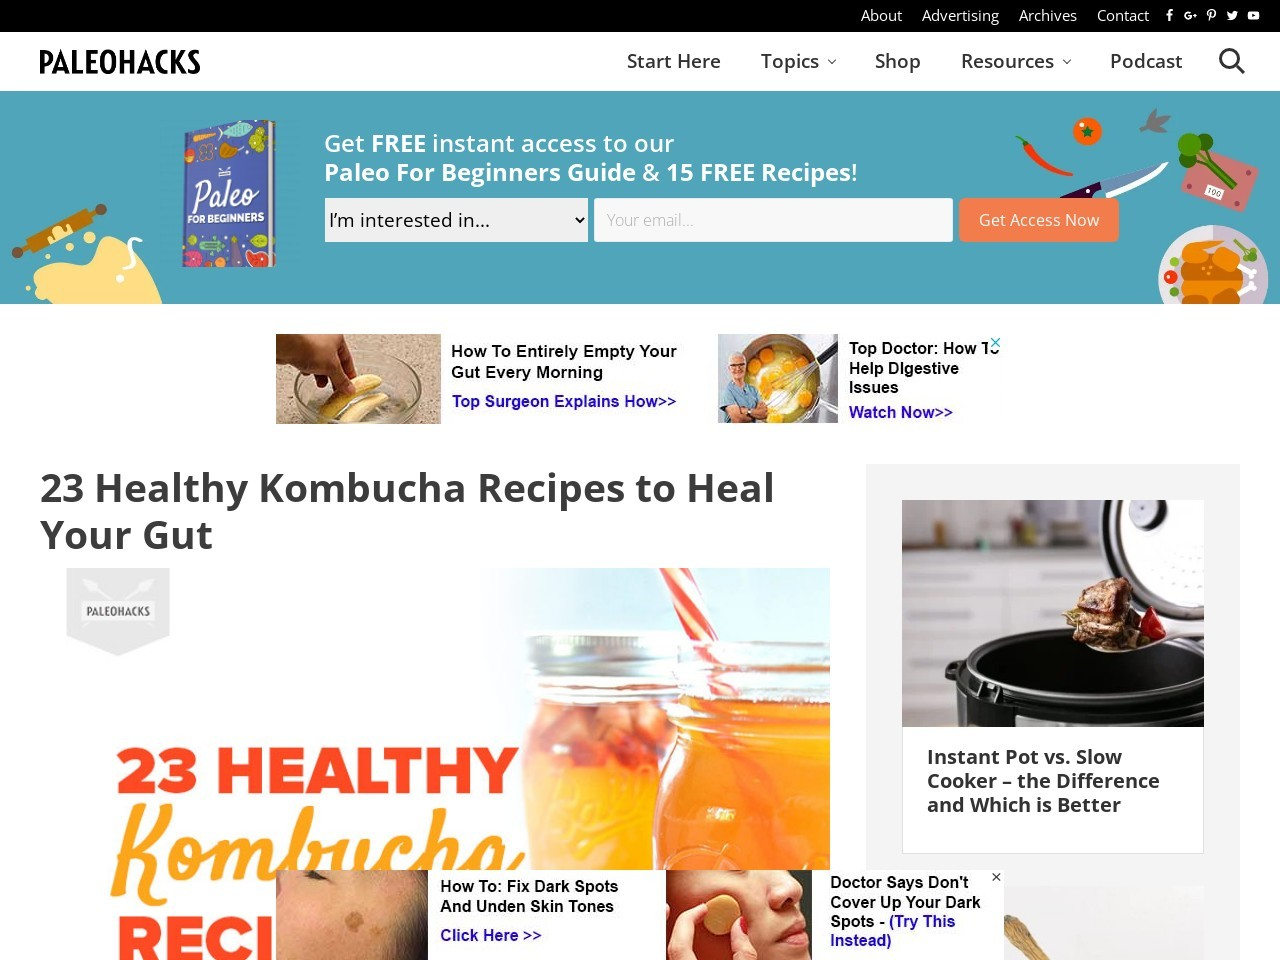 23 Healthy Kombucha Recipes to Heal Your Gut